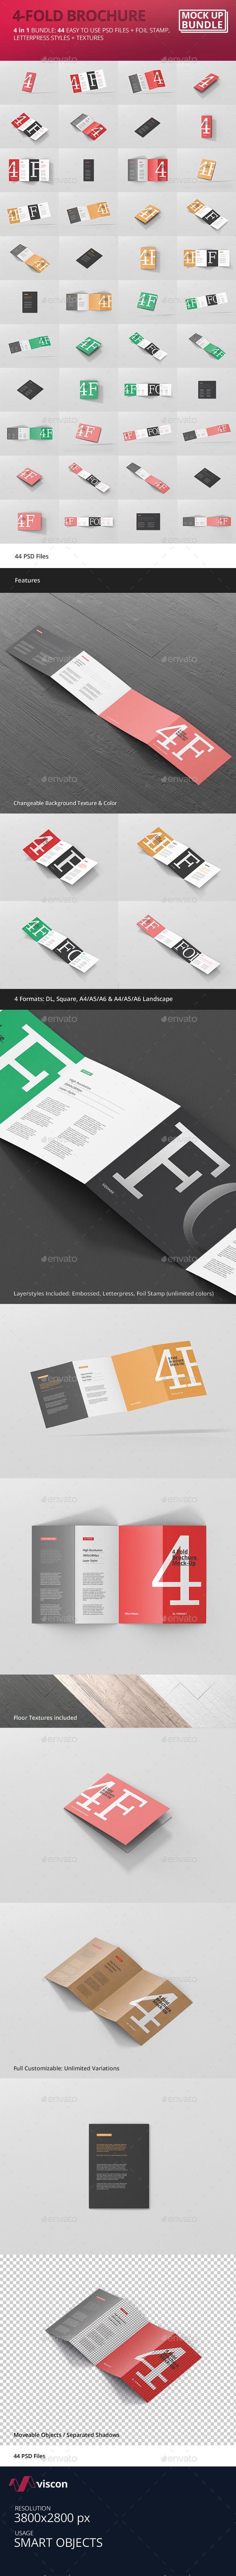 4 fold brochure mockup bundle